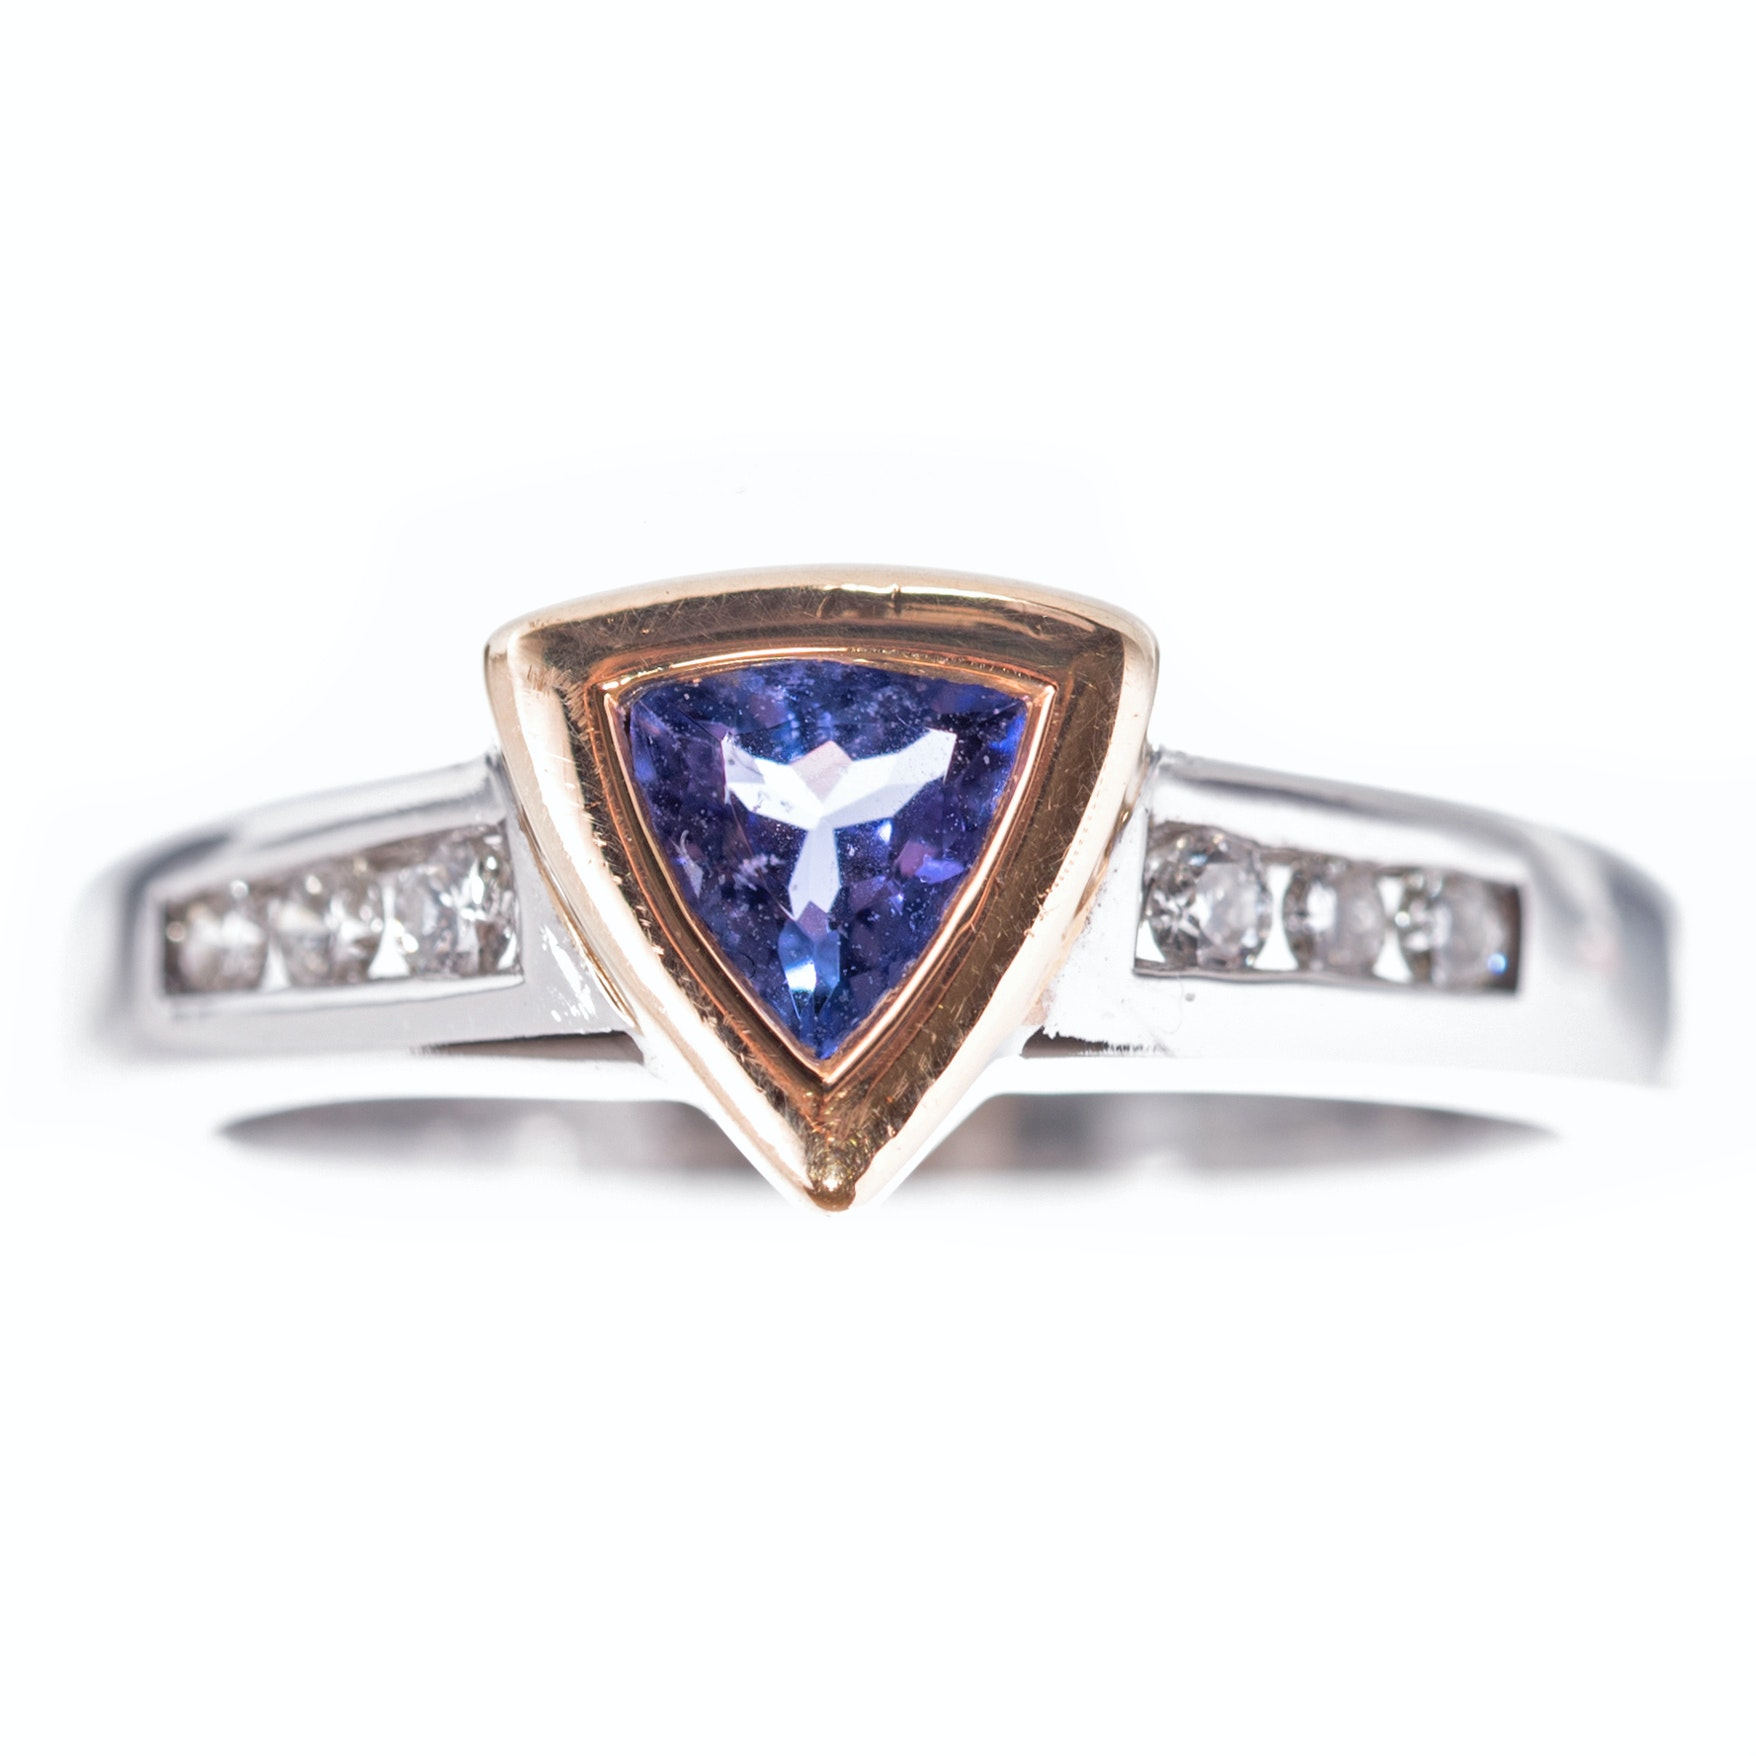 14K White Gold, Tanzanite, and Diamond Ring